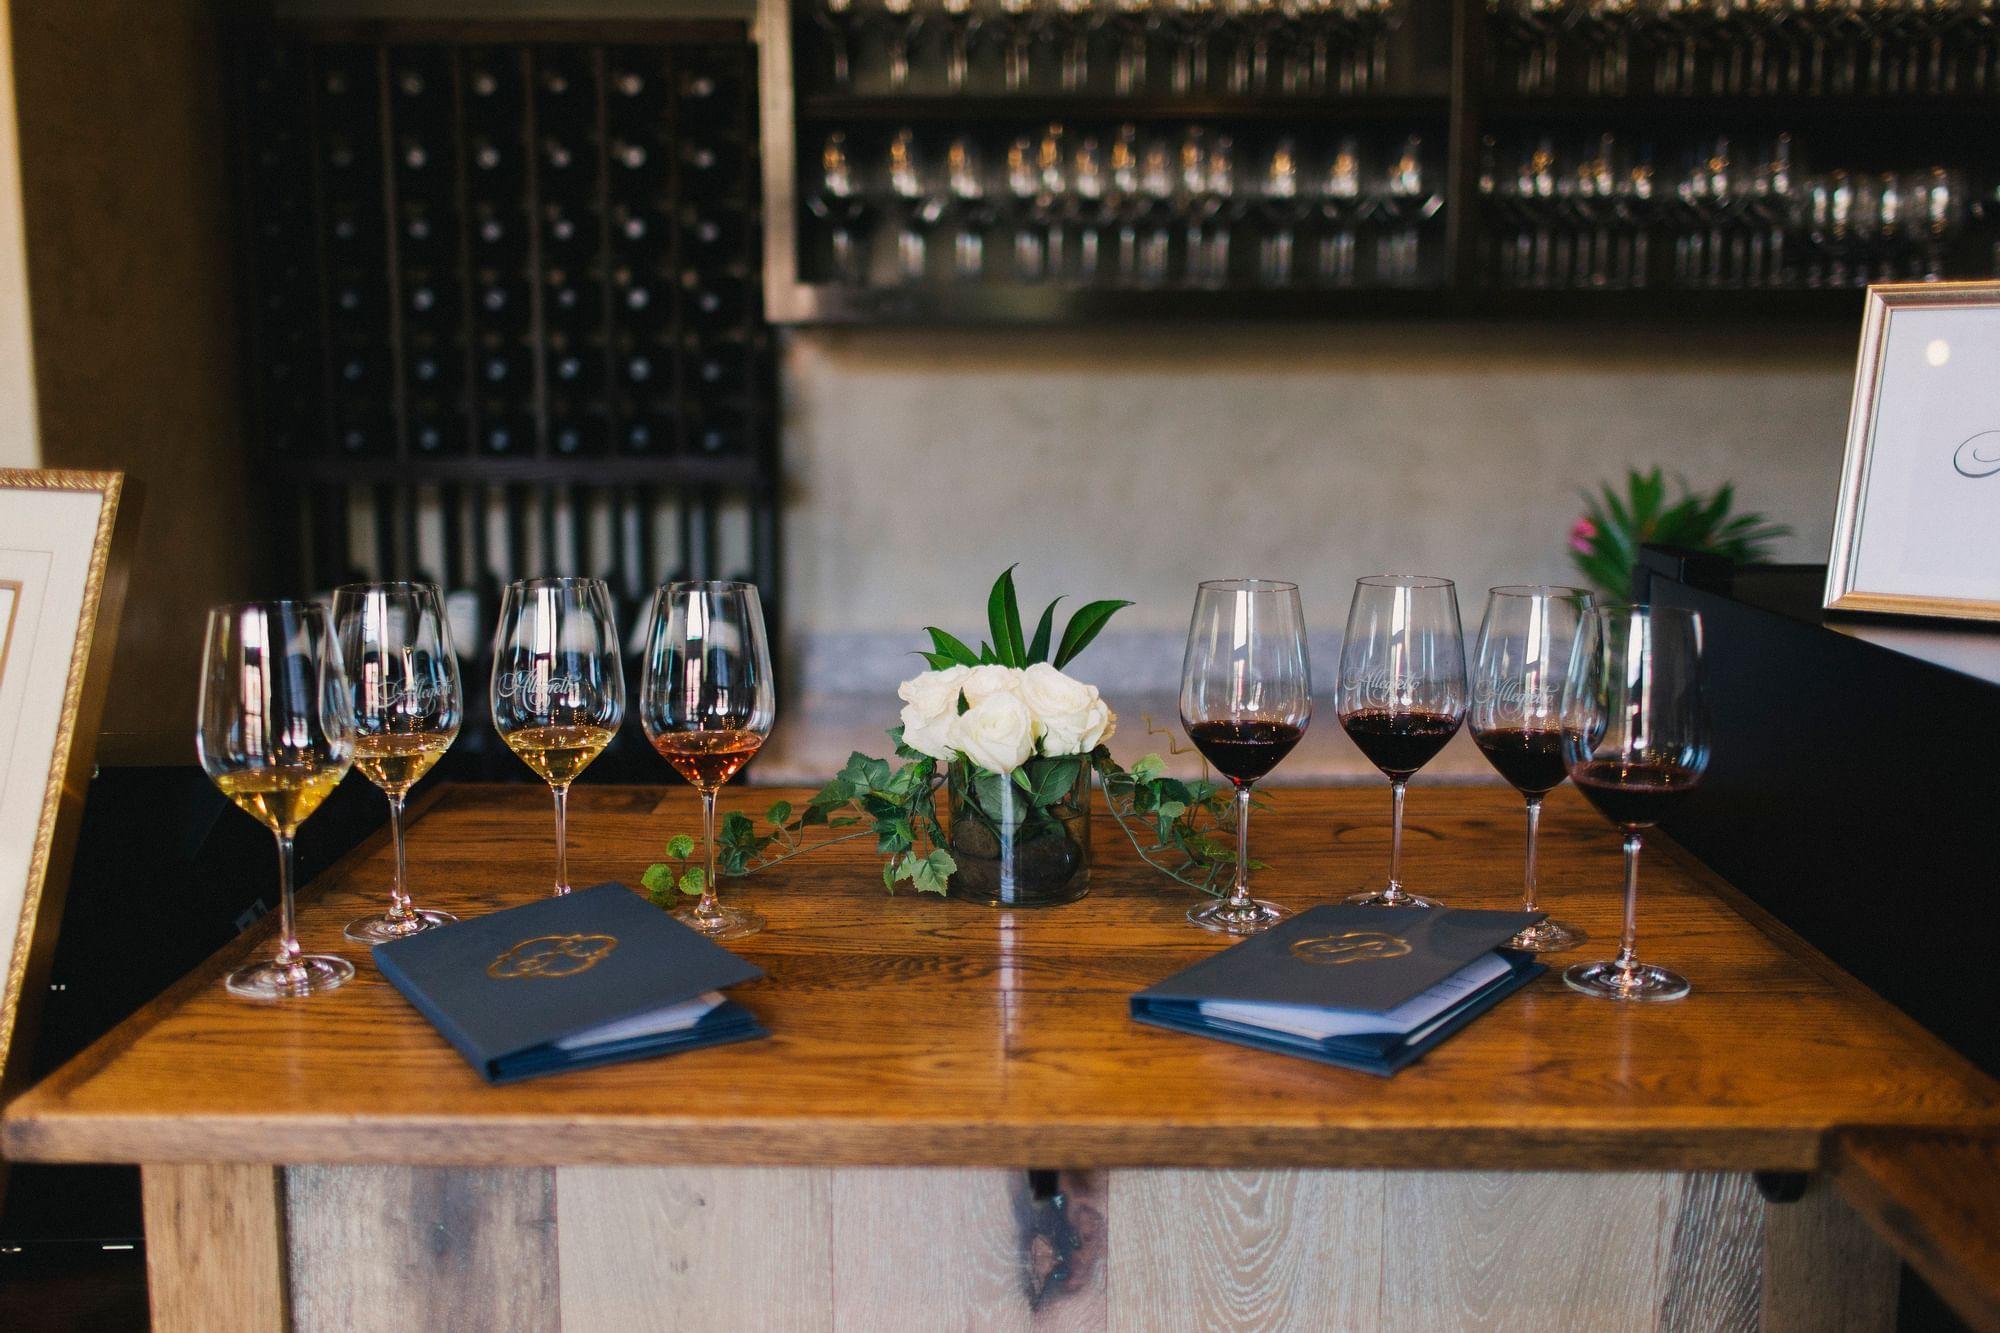 Eight glasses of wine split by a white flower arrangement